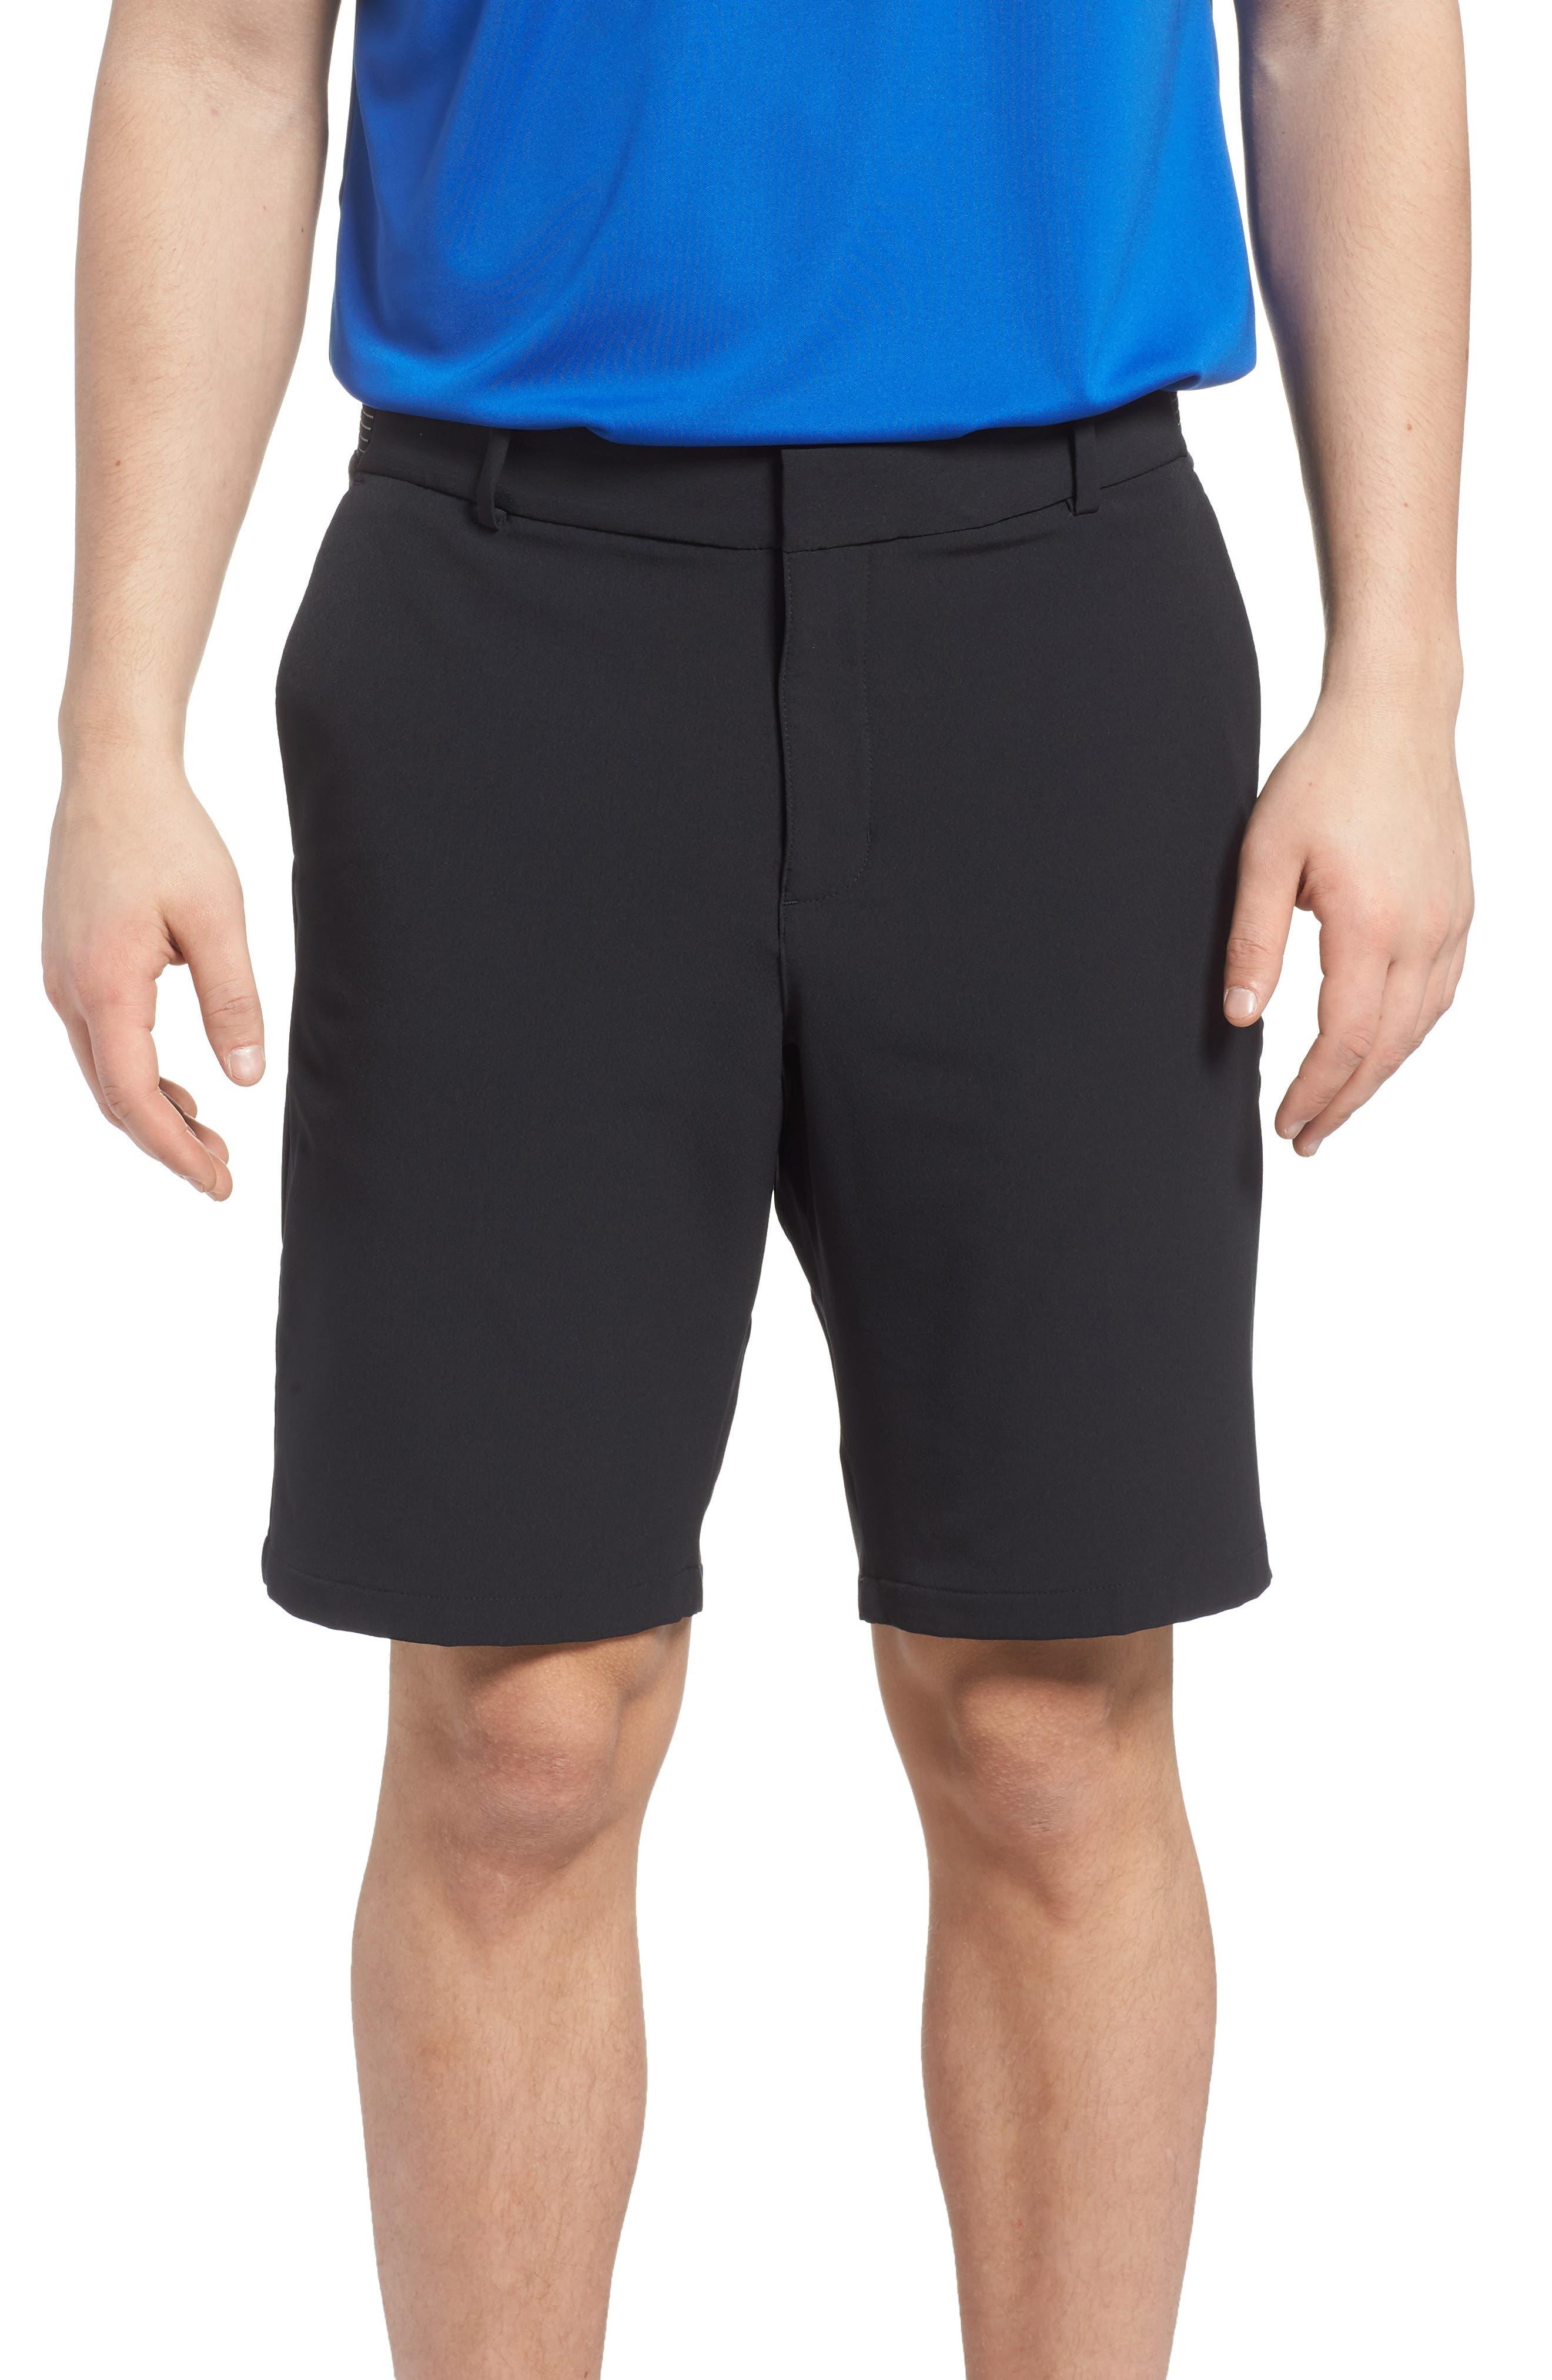 NIKE Flex Slim Fit Dri-FIT Golf Shorts, Main, color, BLACK/ BLACK